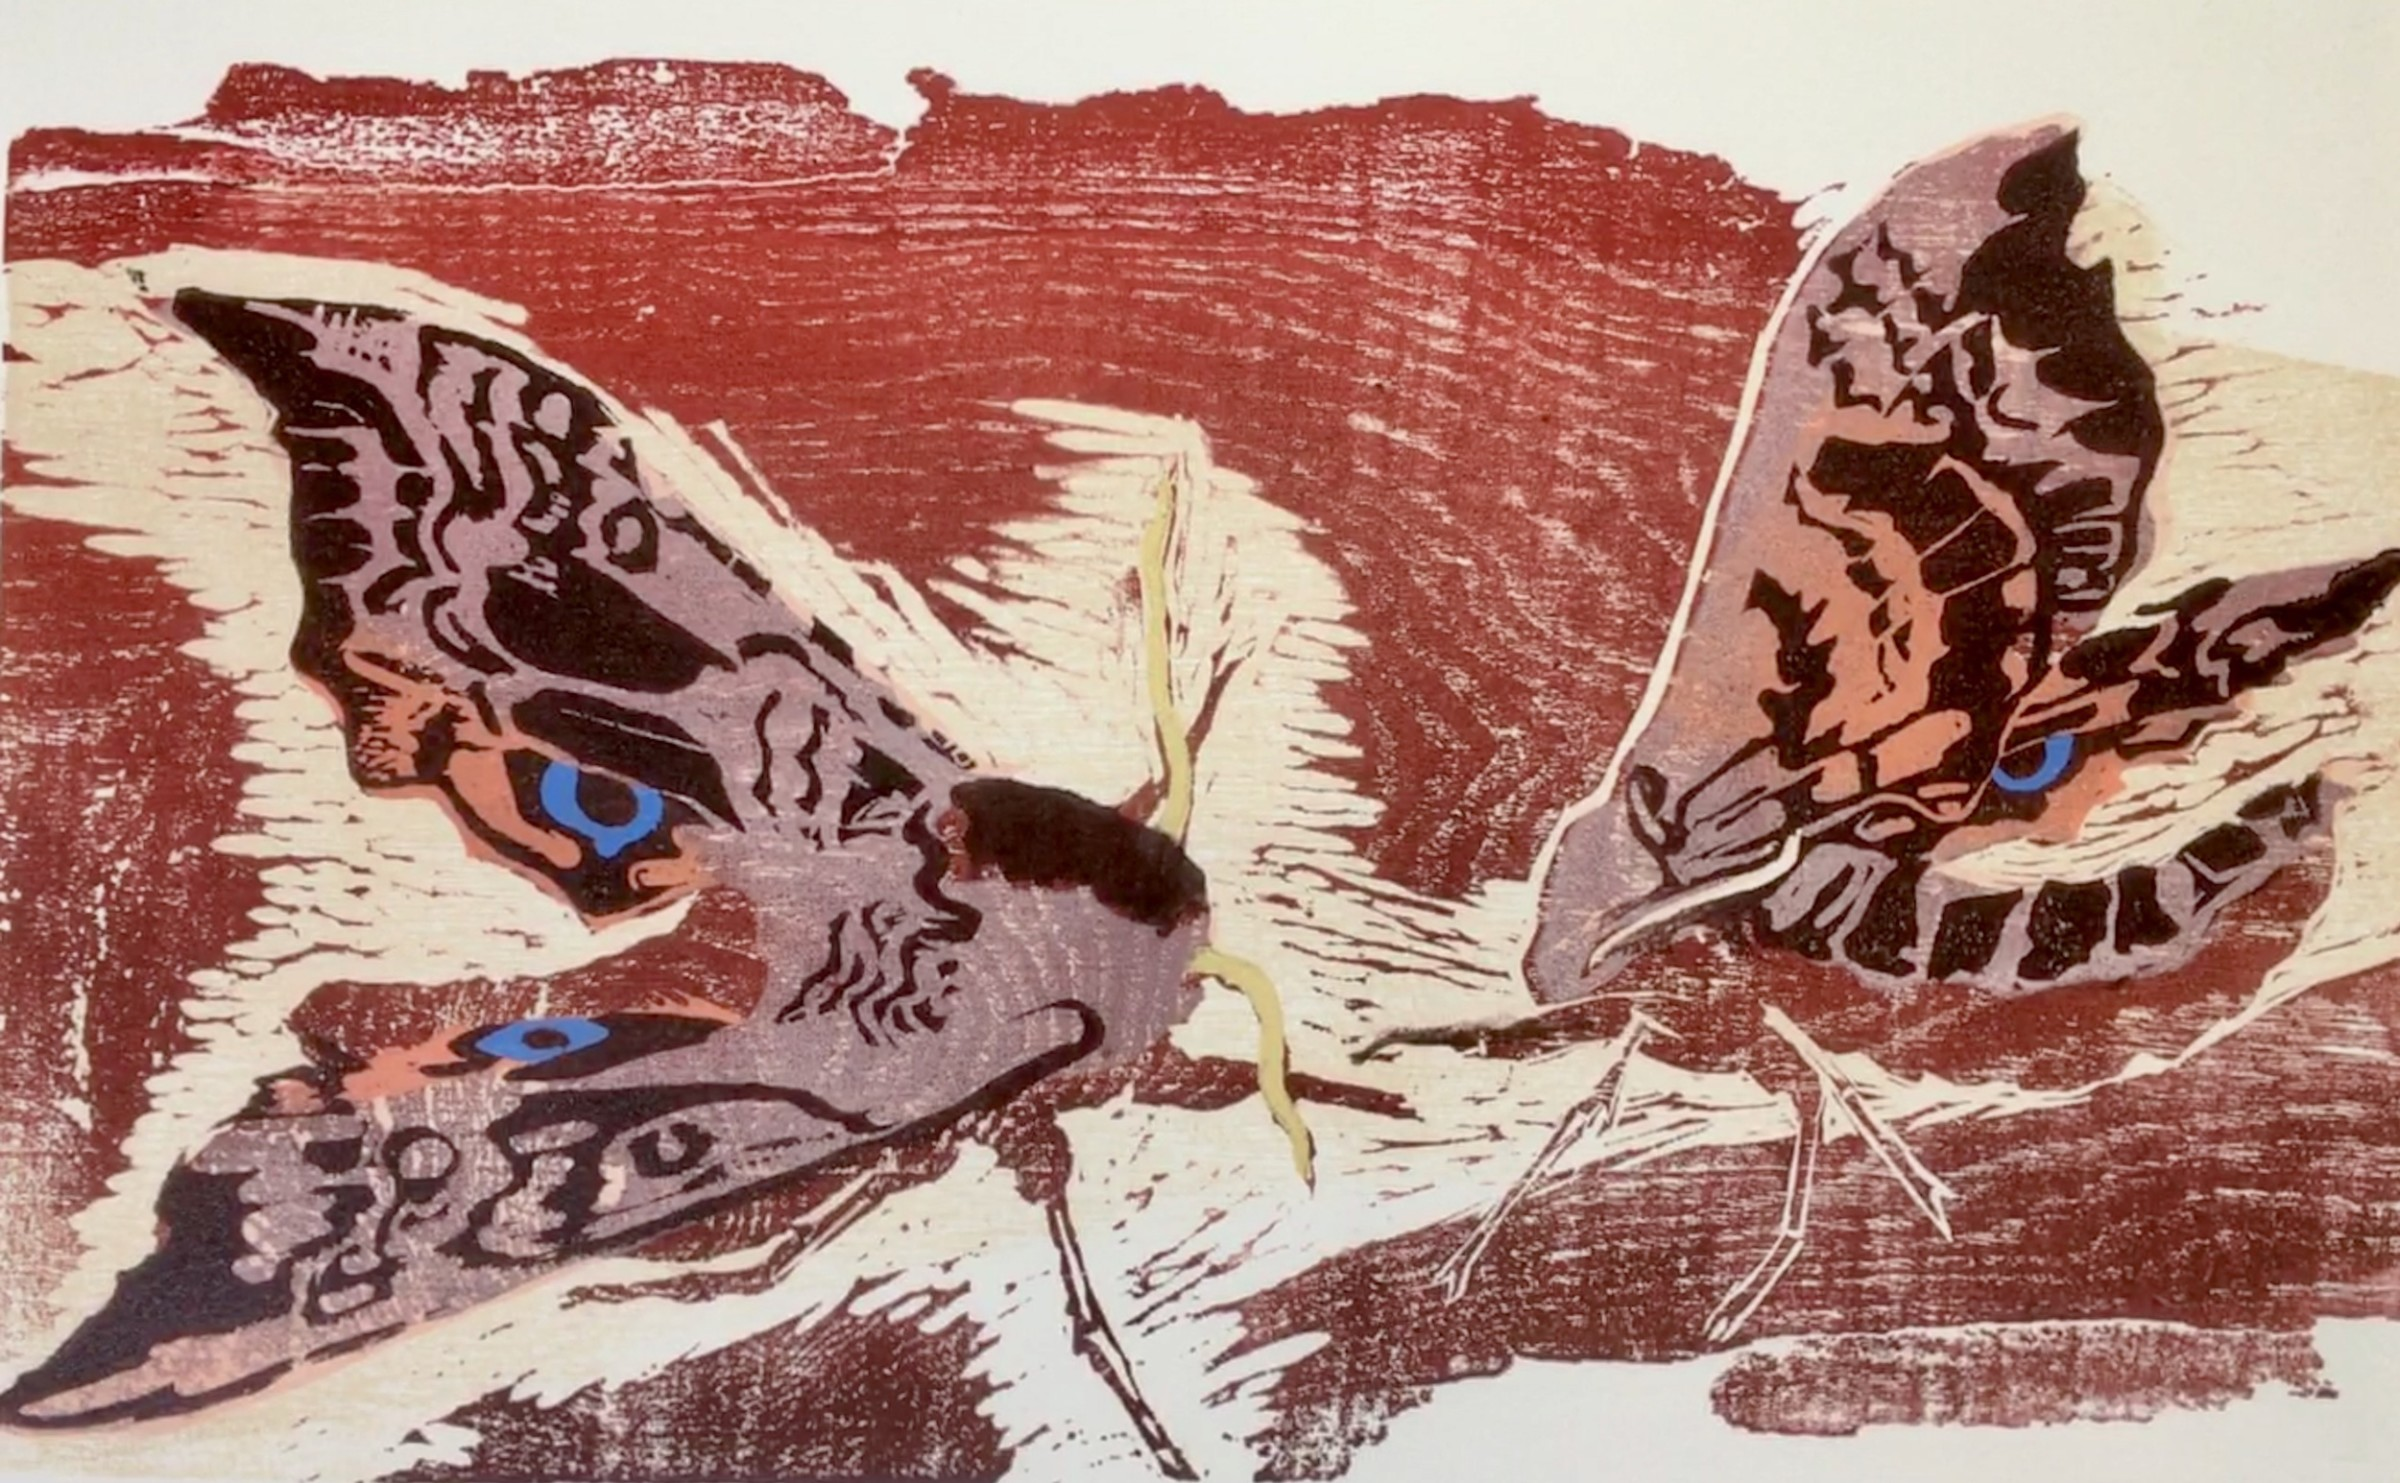 "<span class=""link fancybox-details-link""><a href=""/exhibitions/20/works/artworks_standalone10773/"">View Detail Page</a></span><div class=""artist""><span class=""artist""><strong>Julia Manning RE</strong></span></div><div class=""title""><em>My Garden Moths, Hawk eye Moth</em></div><div class=""medium"">wood and lino cuts<br></div><div class=""dimensions"">30 x 46 cm image size<br></div><div class=""edition_details"">edition of 35</div>"